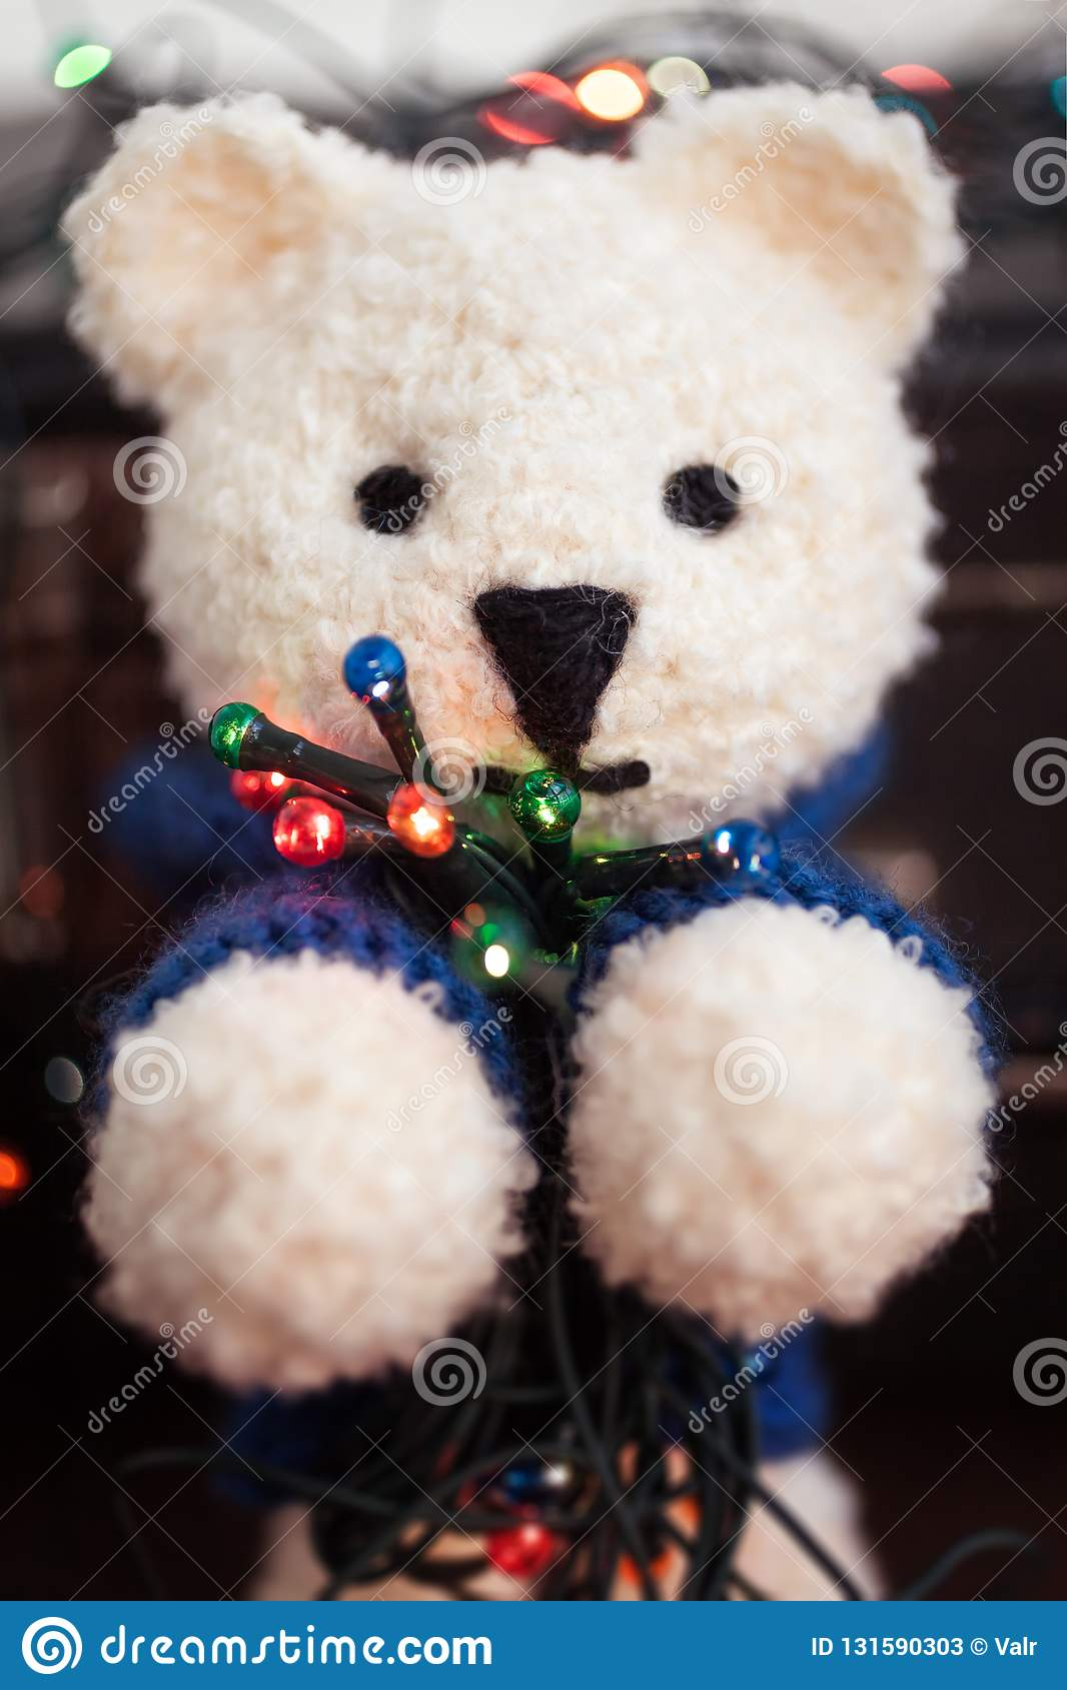 Cute white teddy bear with Christmas lights